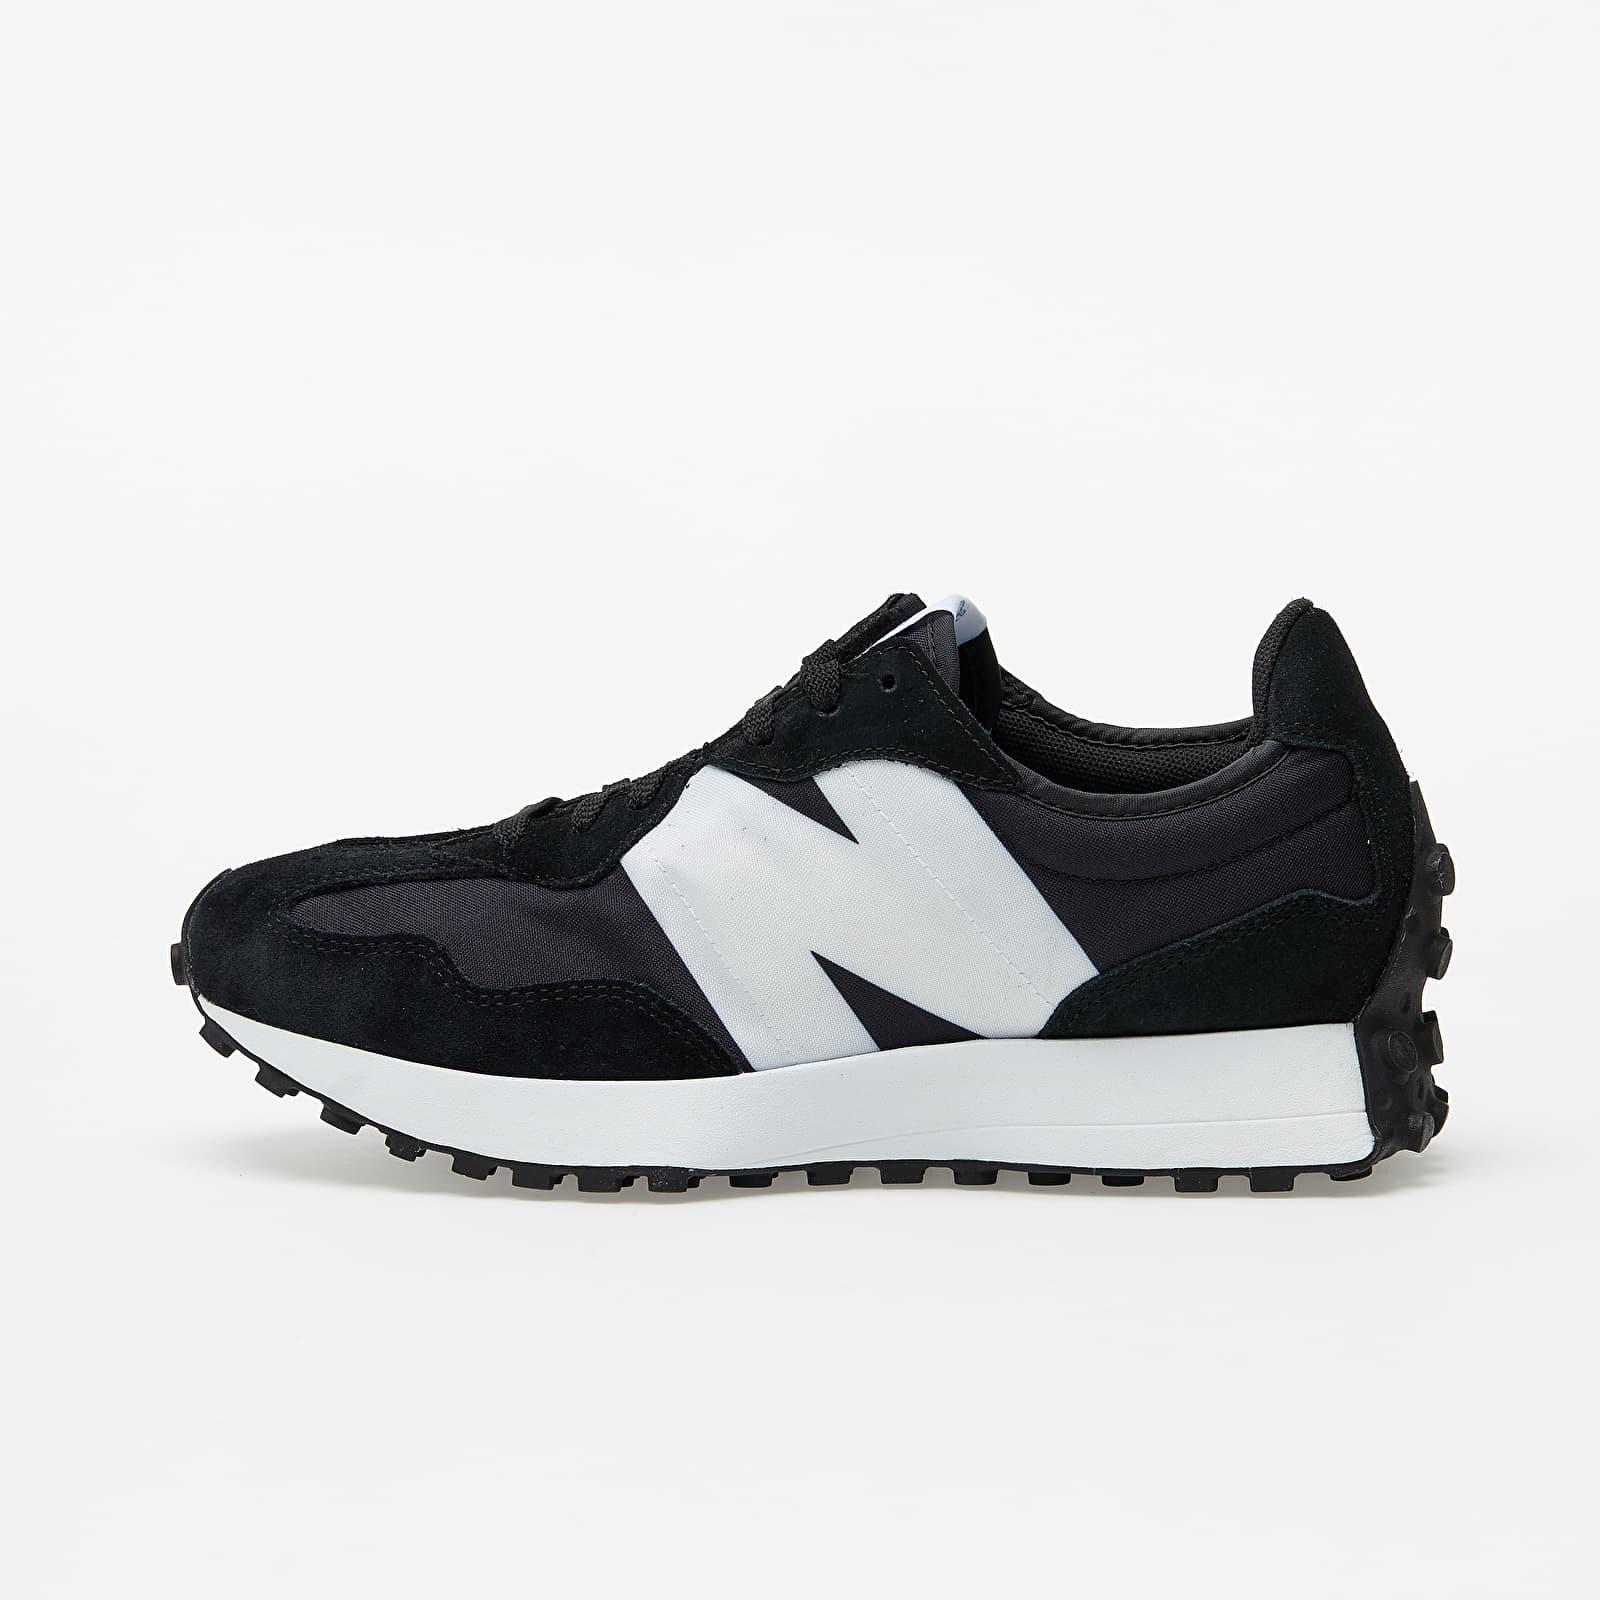 New Balance 327 Black/ White EUR 44.5